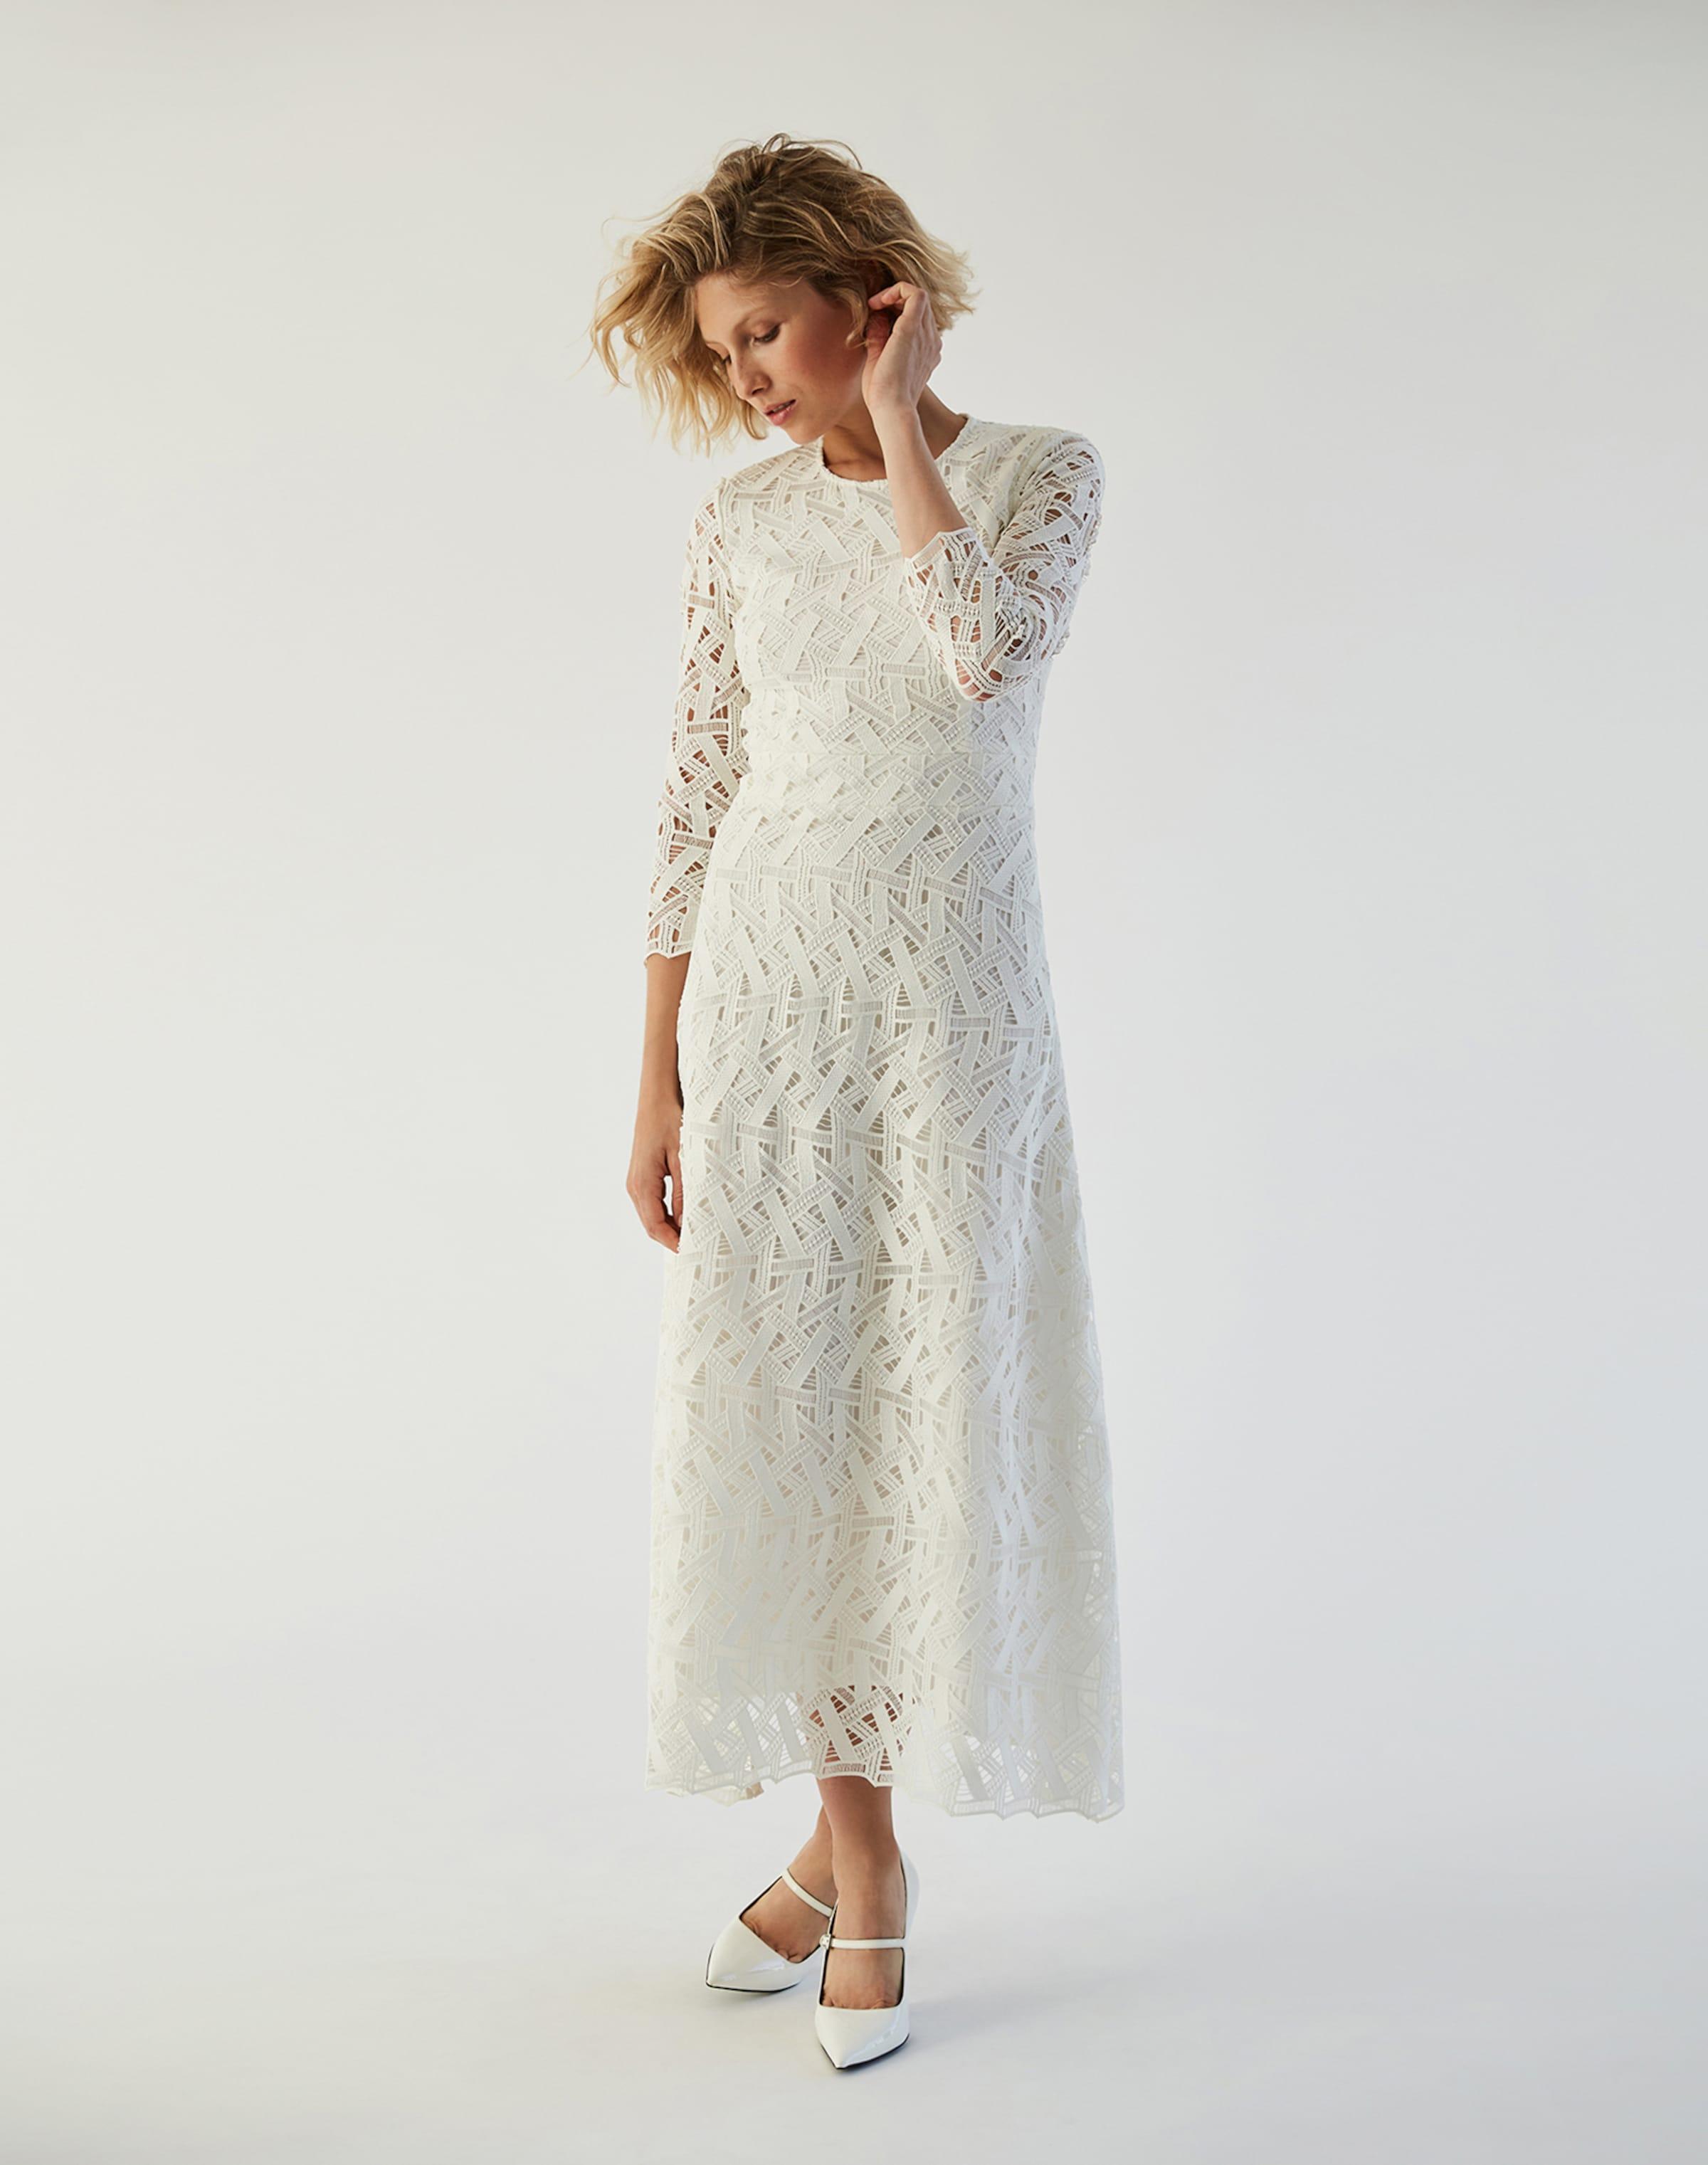 Ivyamp; Oak Weiß In Dress Oak Weiß Ivyamp; In Dress Ivyamp; xthQCrdBso